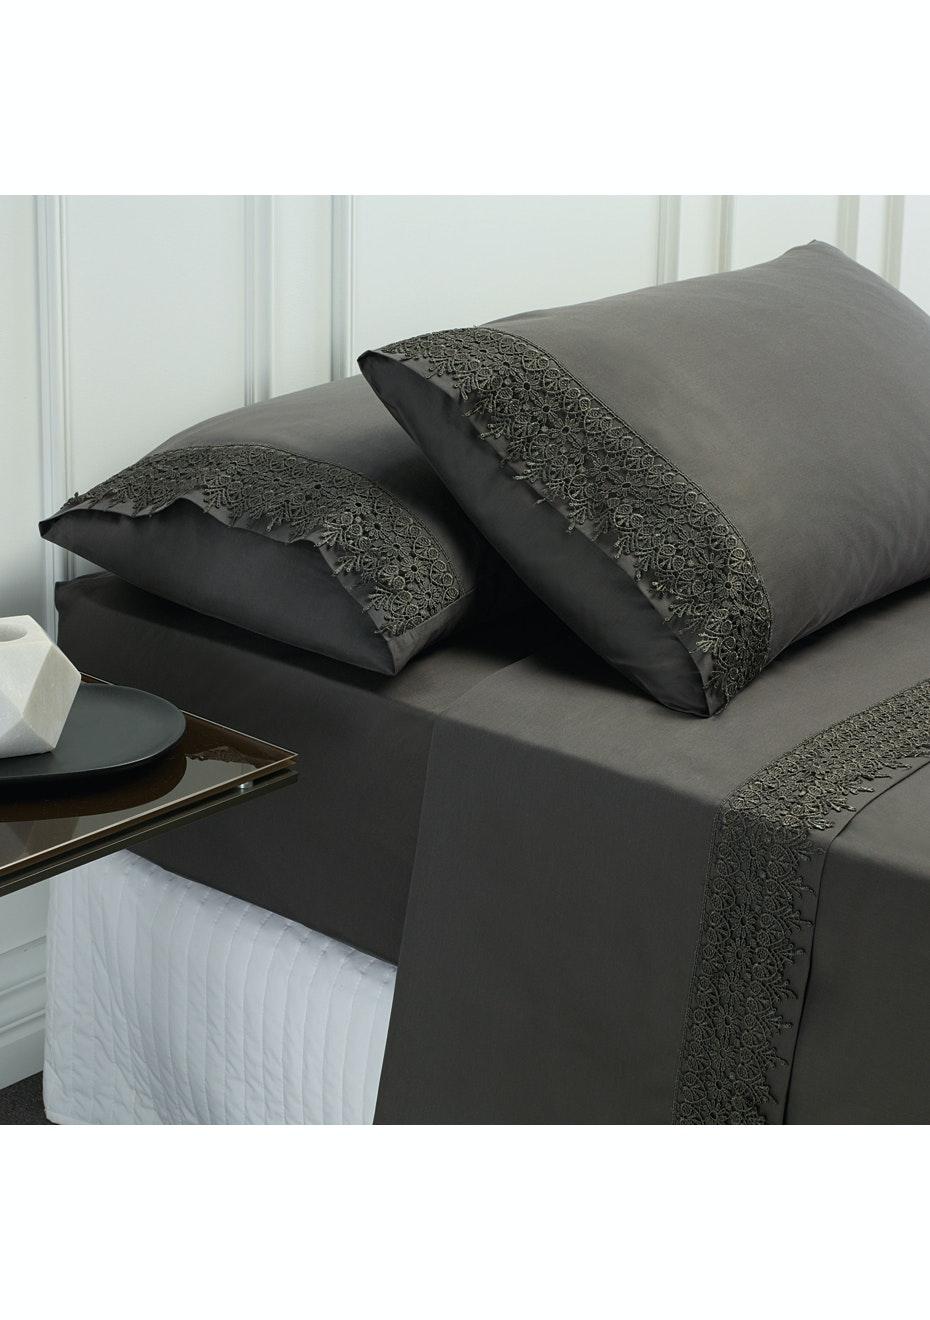 Style & Co 1000 Thread count Egyptian Cotton Hotel Collection Valencia Sheet sets Queen Coal